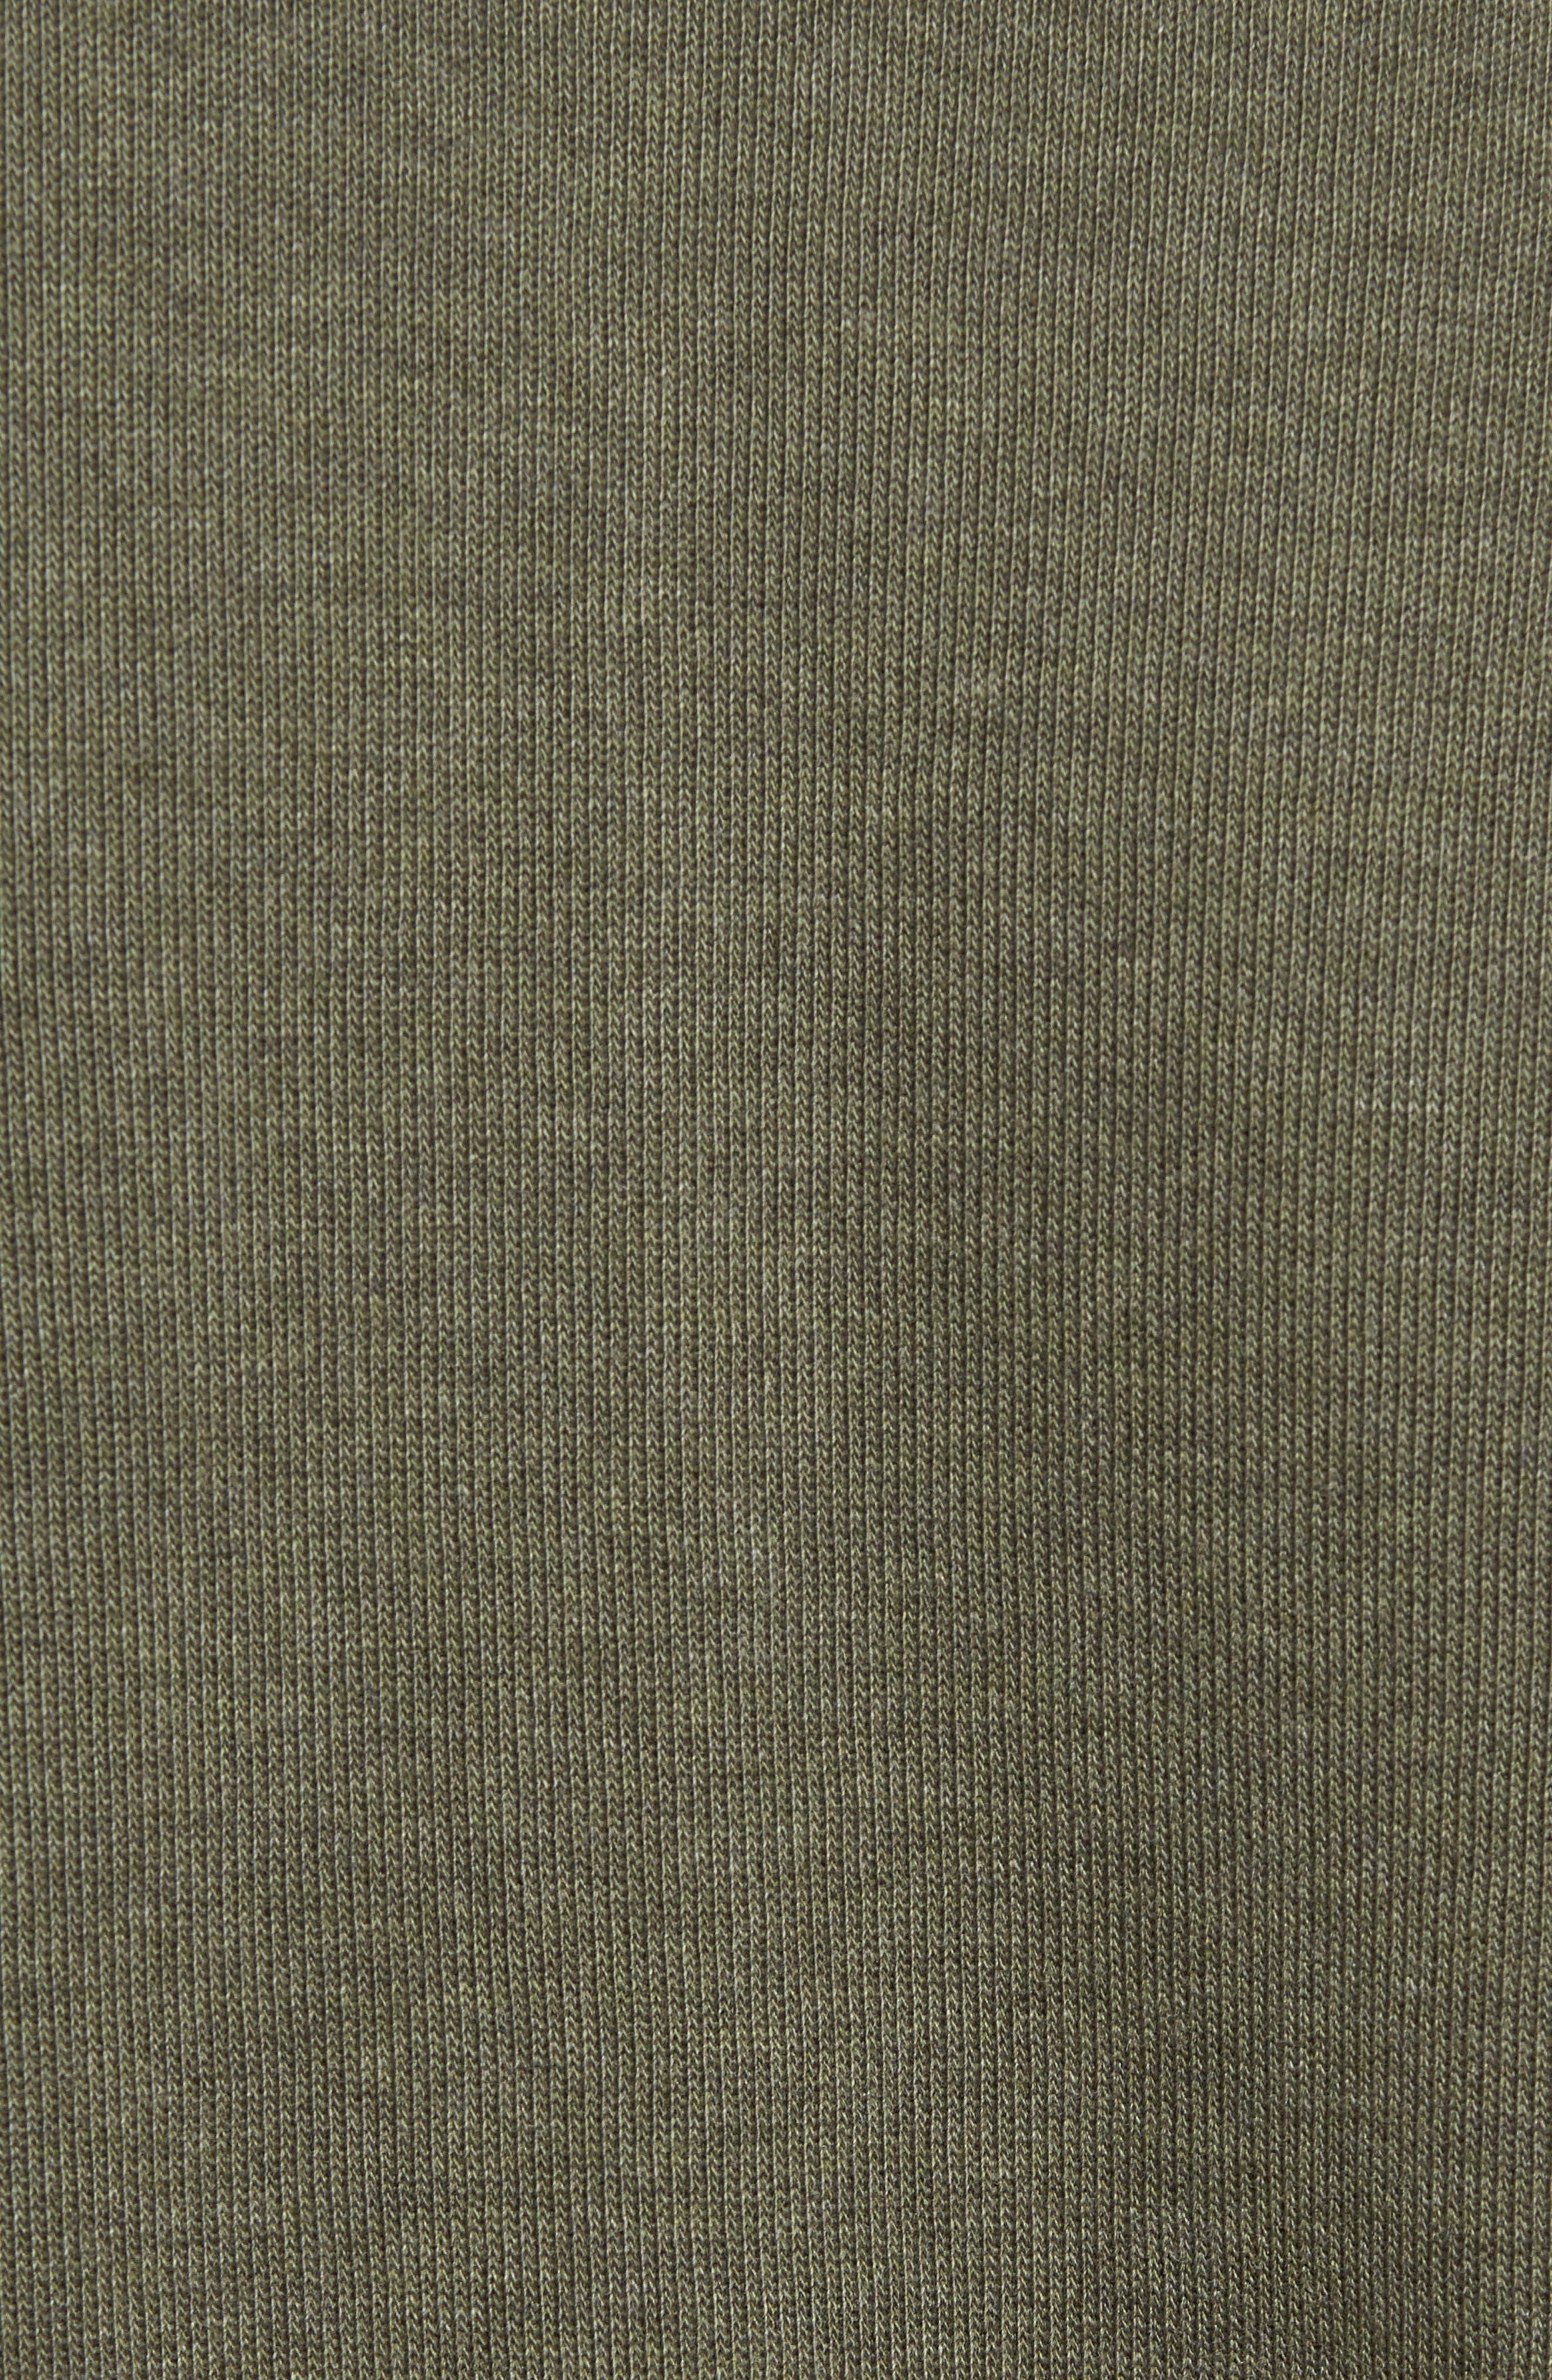 Quarter Zip Sweatshirt,                             Alternate thumbnail 5, color,                             2Qh Army/ Navy Blue